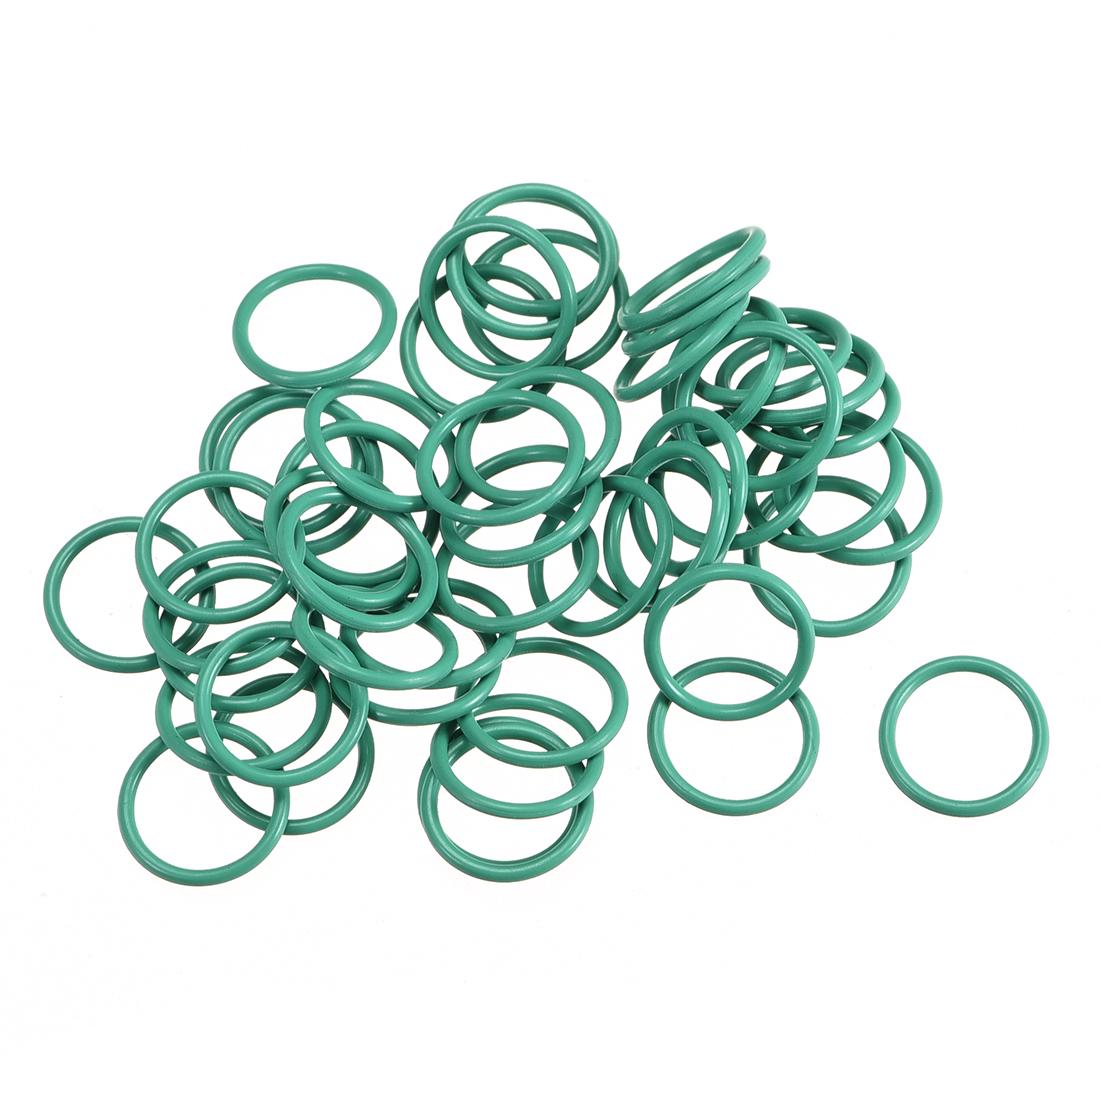 50Pcs 10mm x 1mm FKM O-rings Heat Resistant Sealing Ring Grommets Green